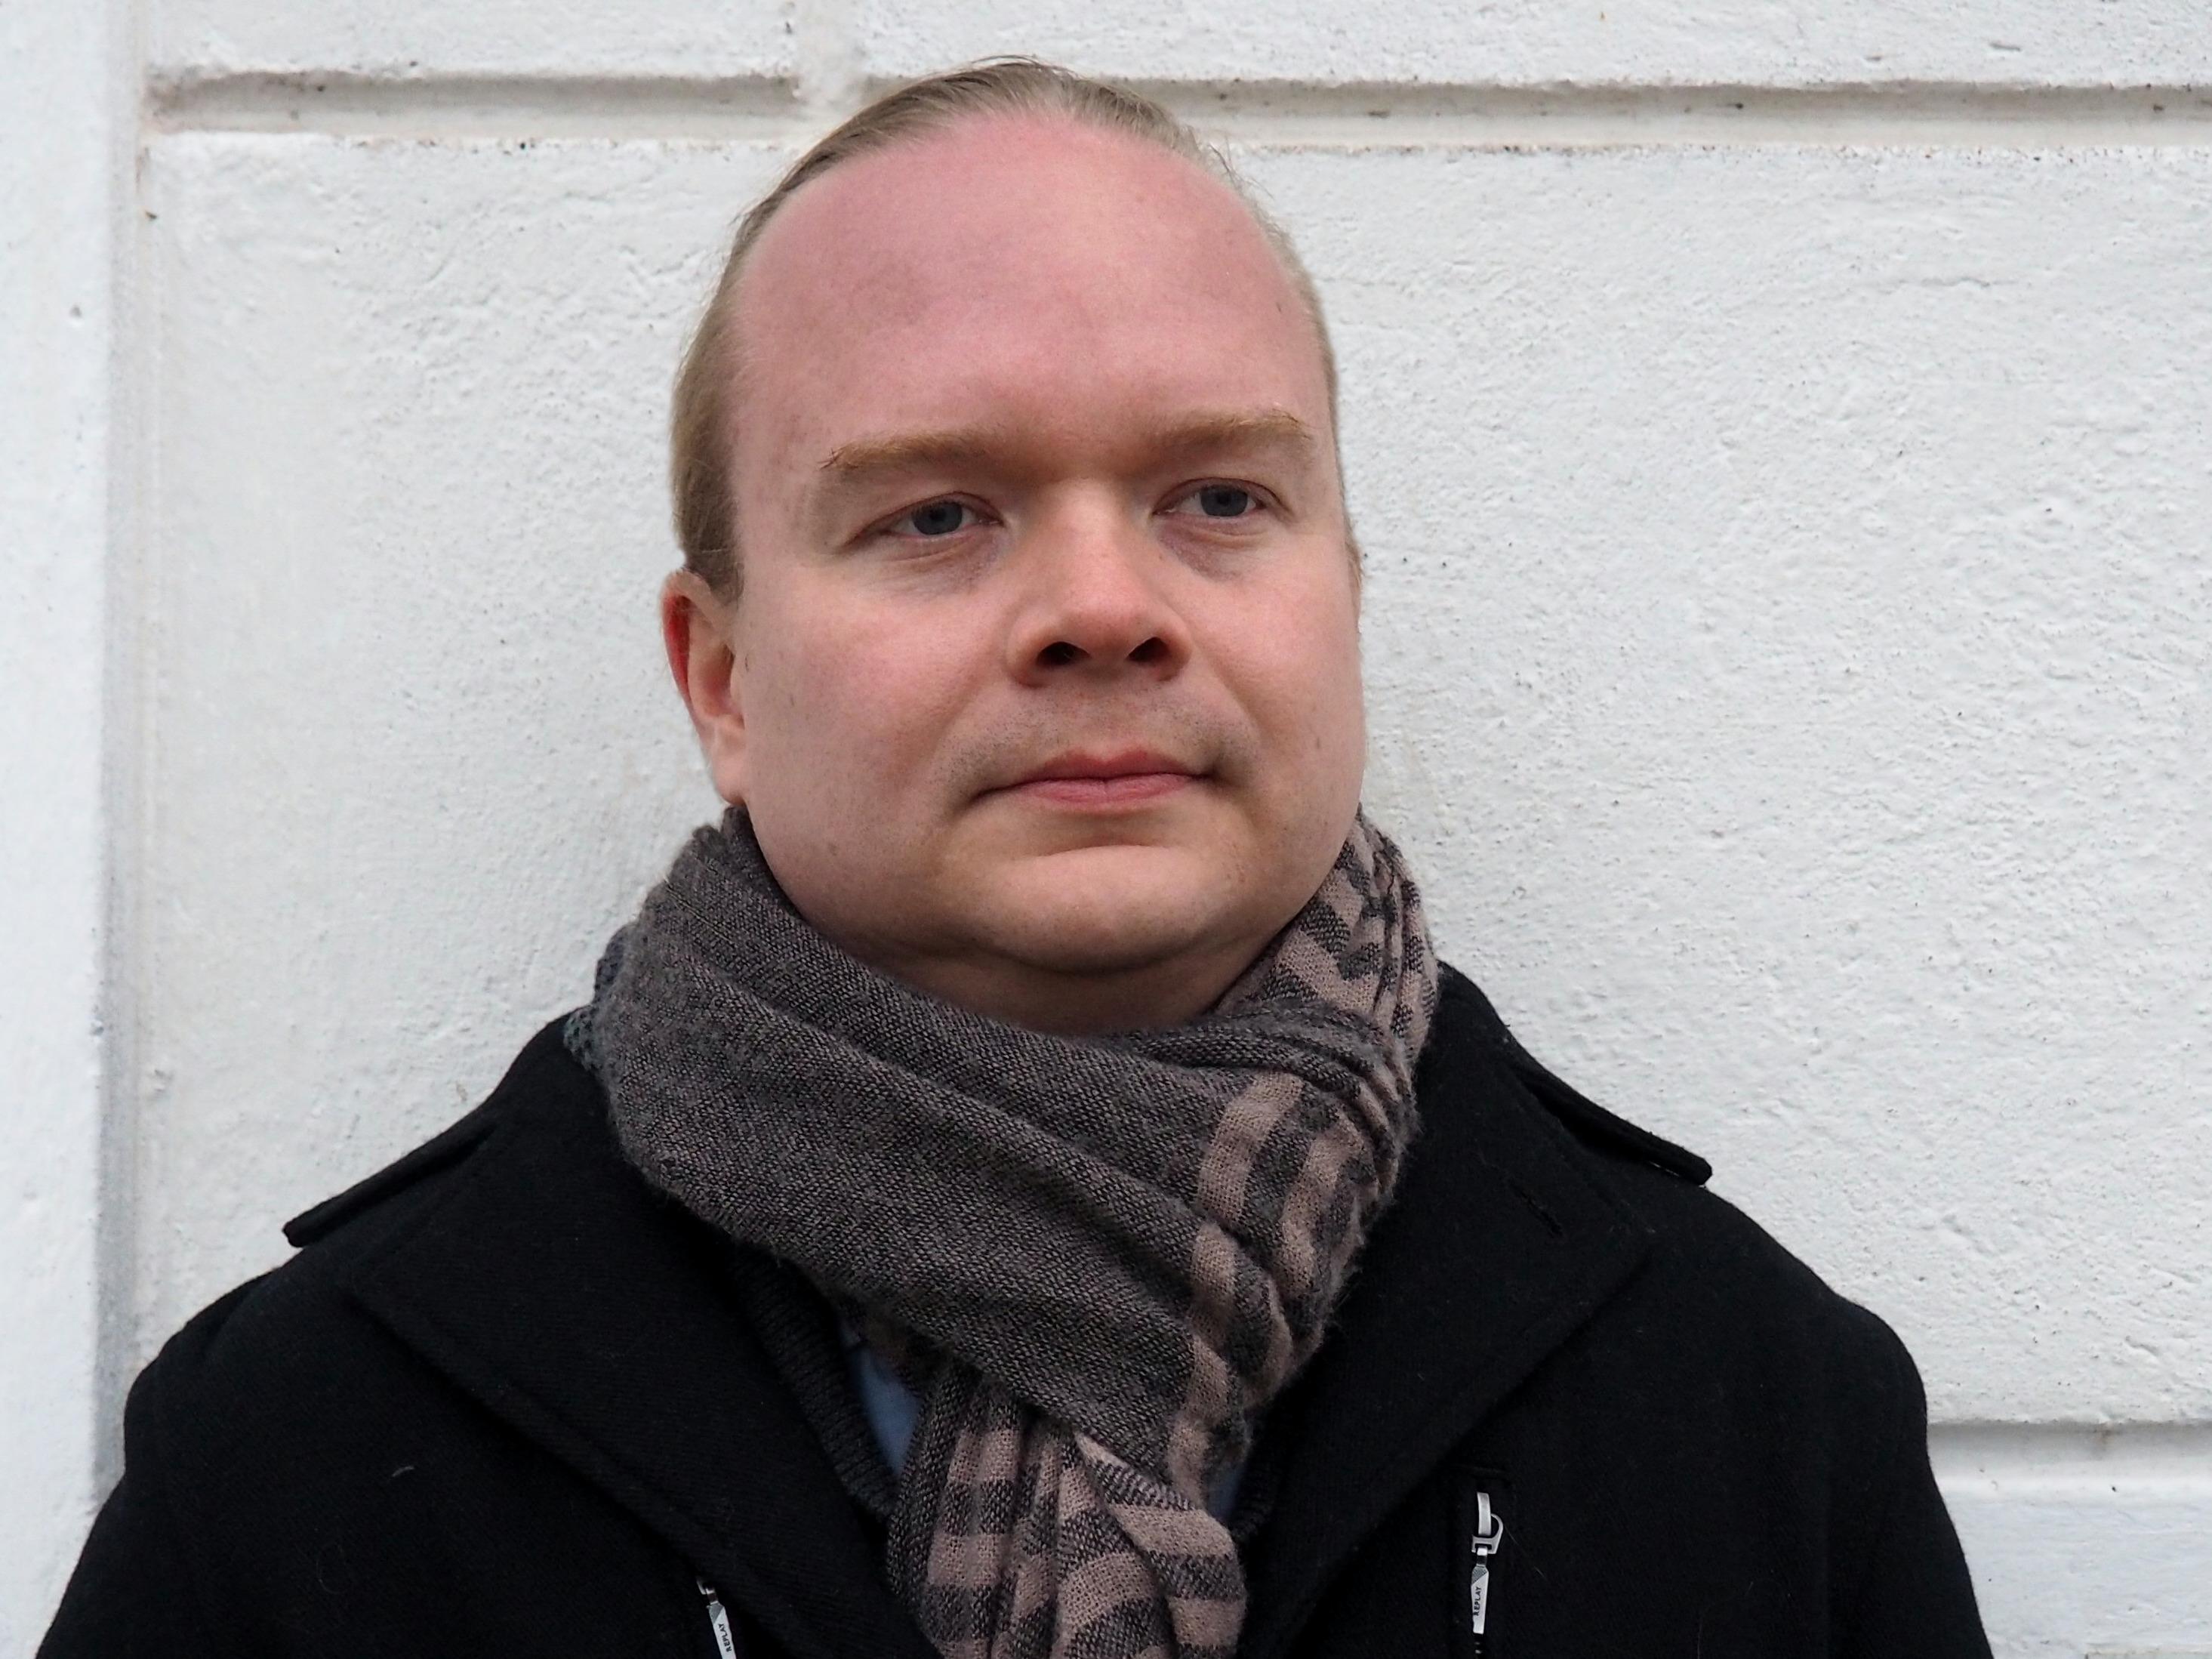 Markus Pantsar